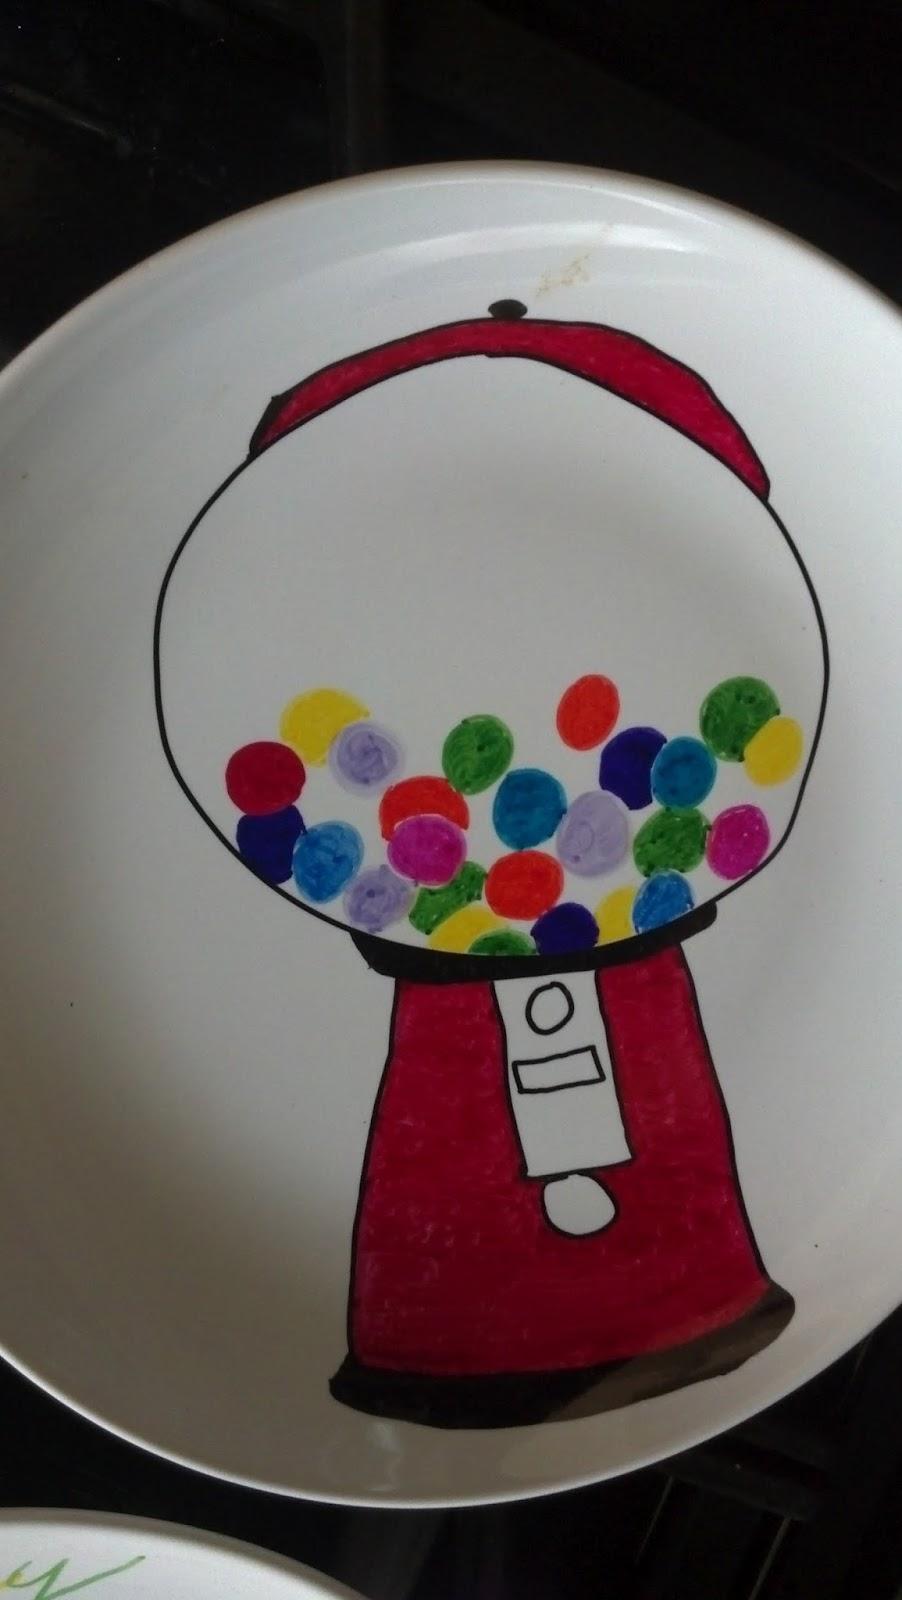 Back to the Basics! & Back to the Basics!: DIY Plate Decorating